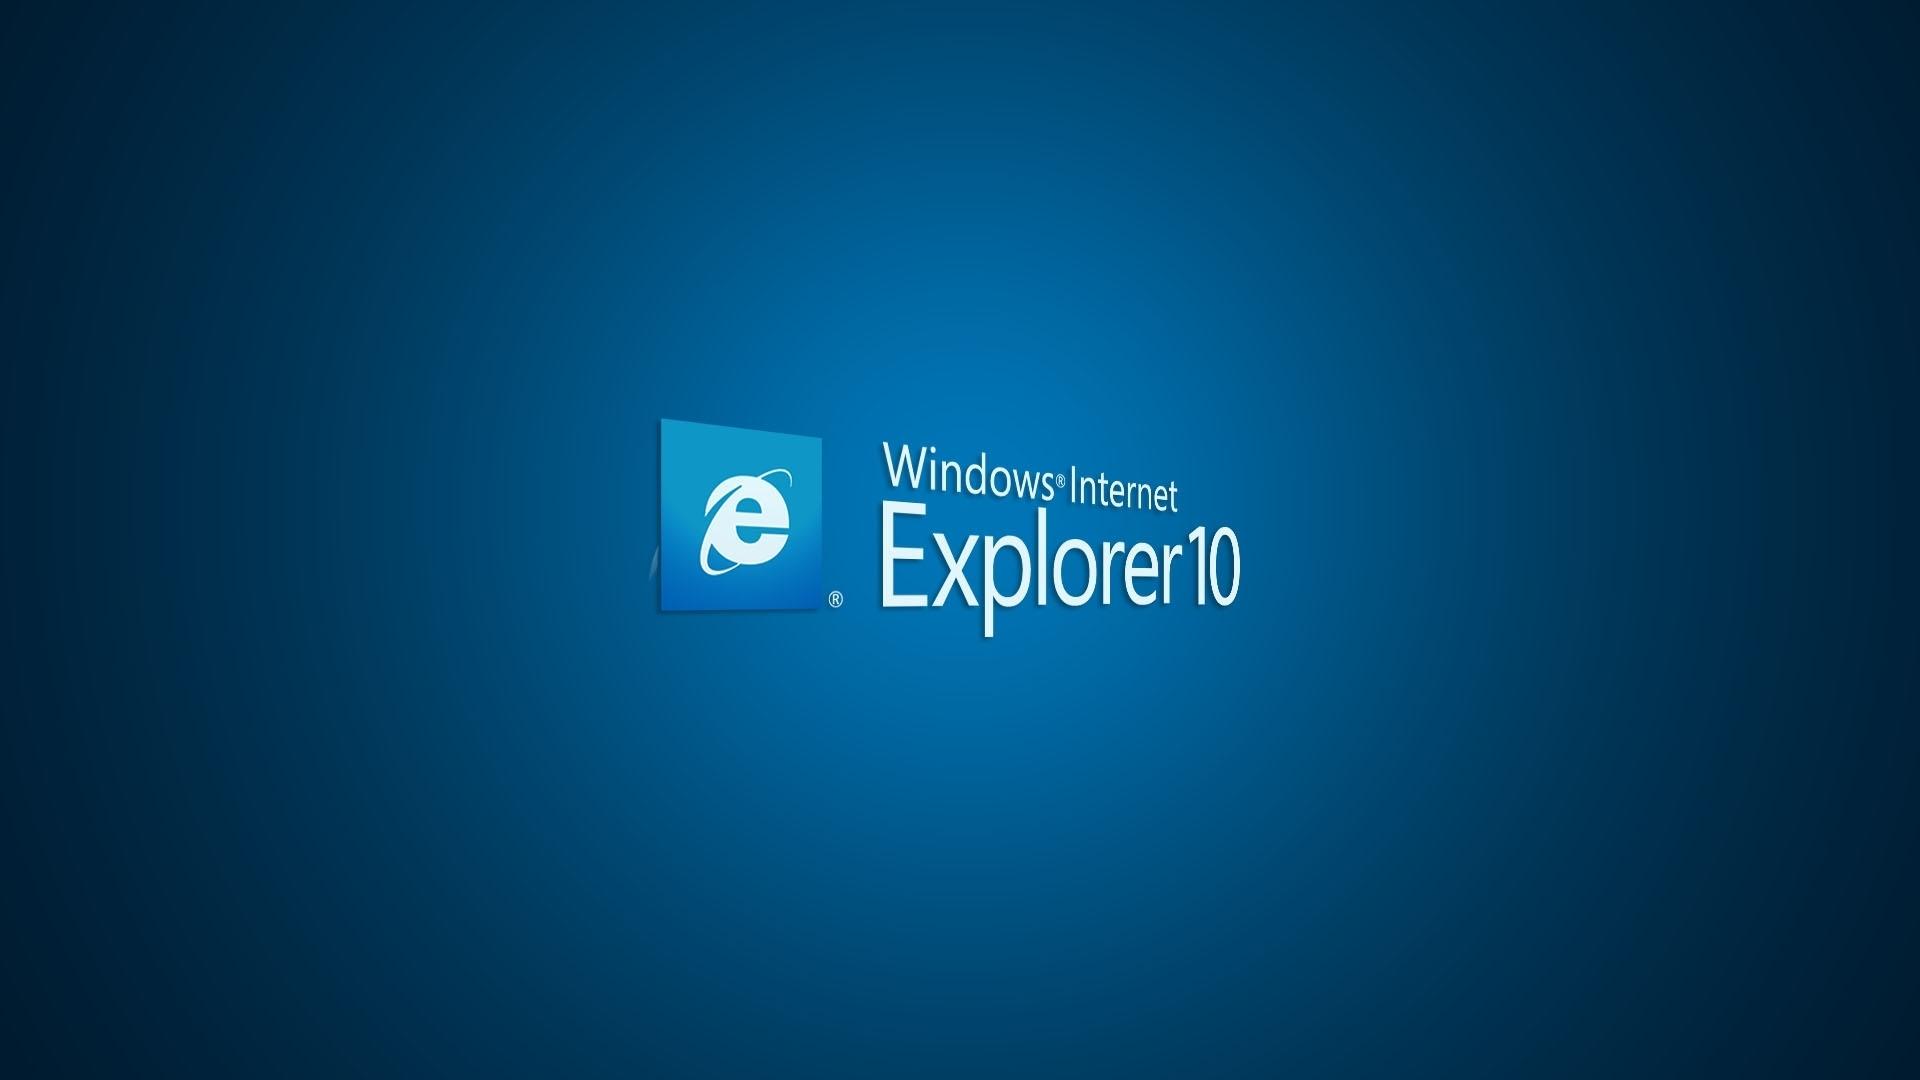 Microsoft Windows Internet Explorer 10   High Definition Wallpapers 1920x1080